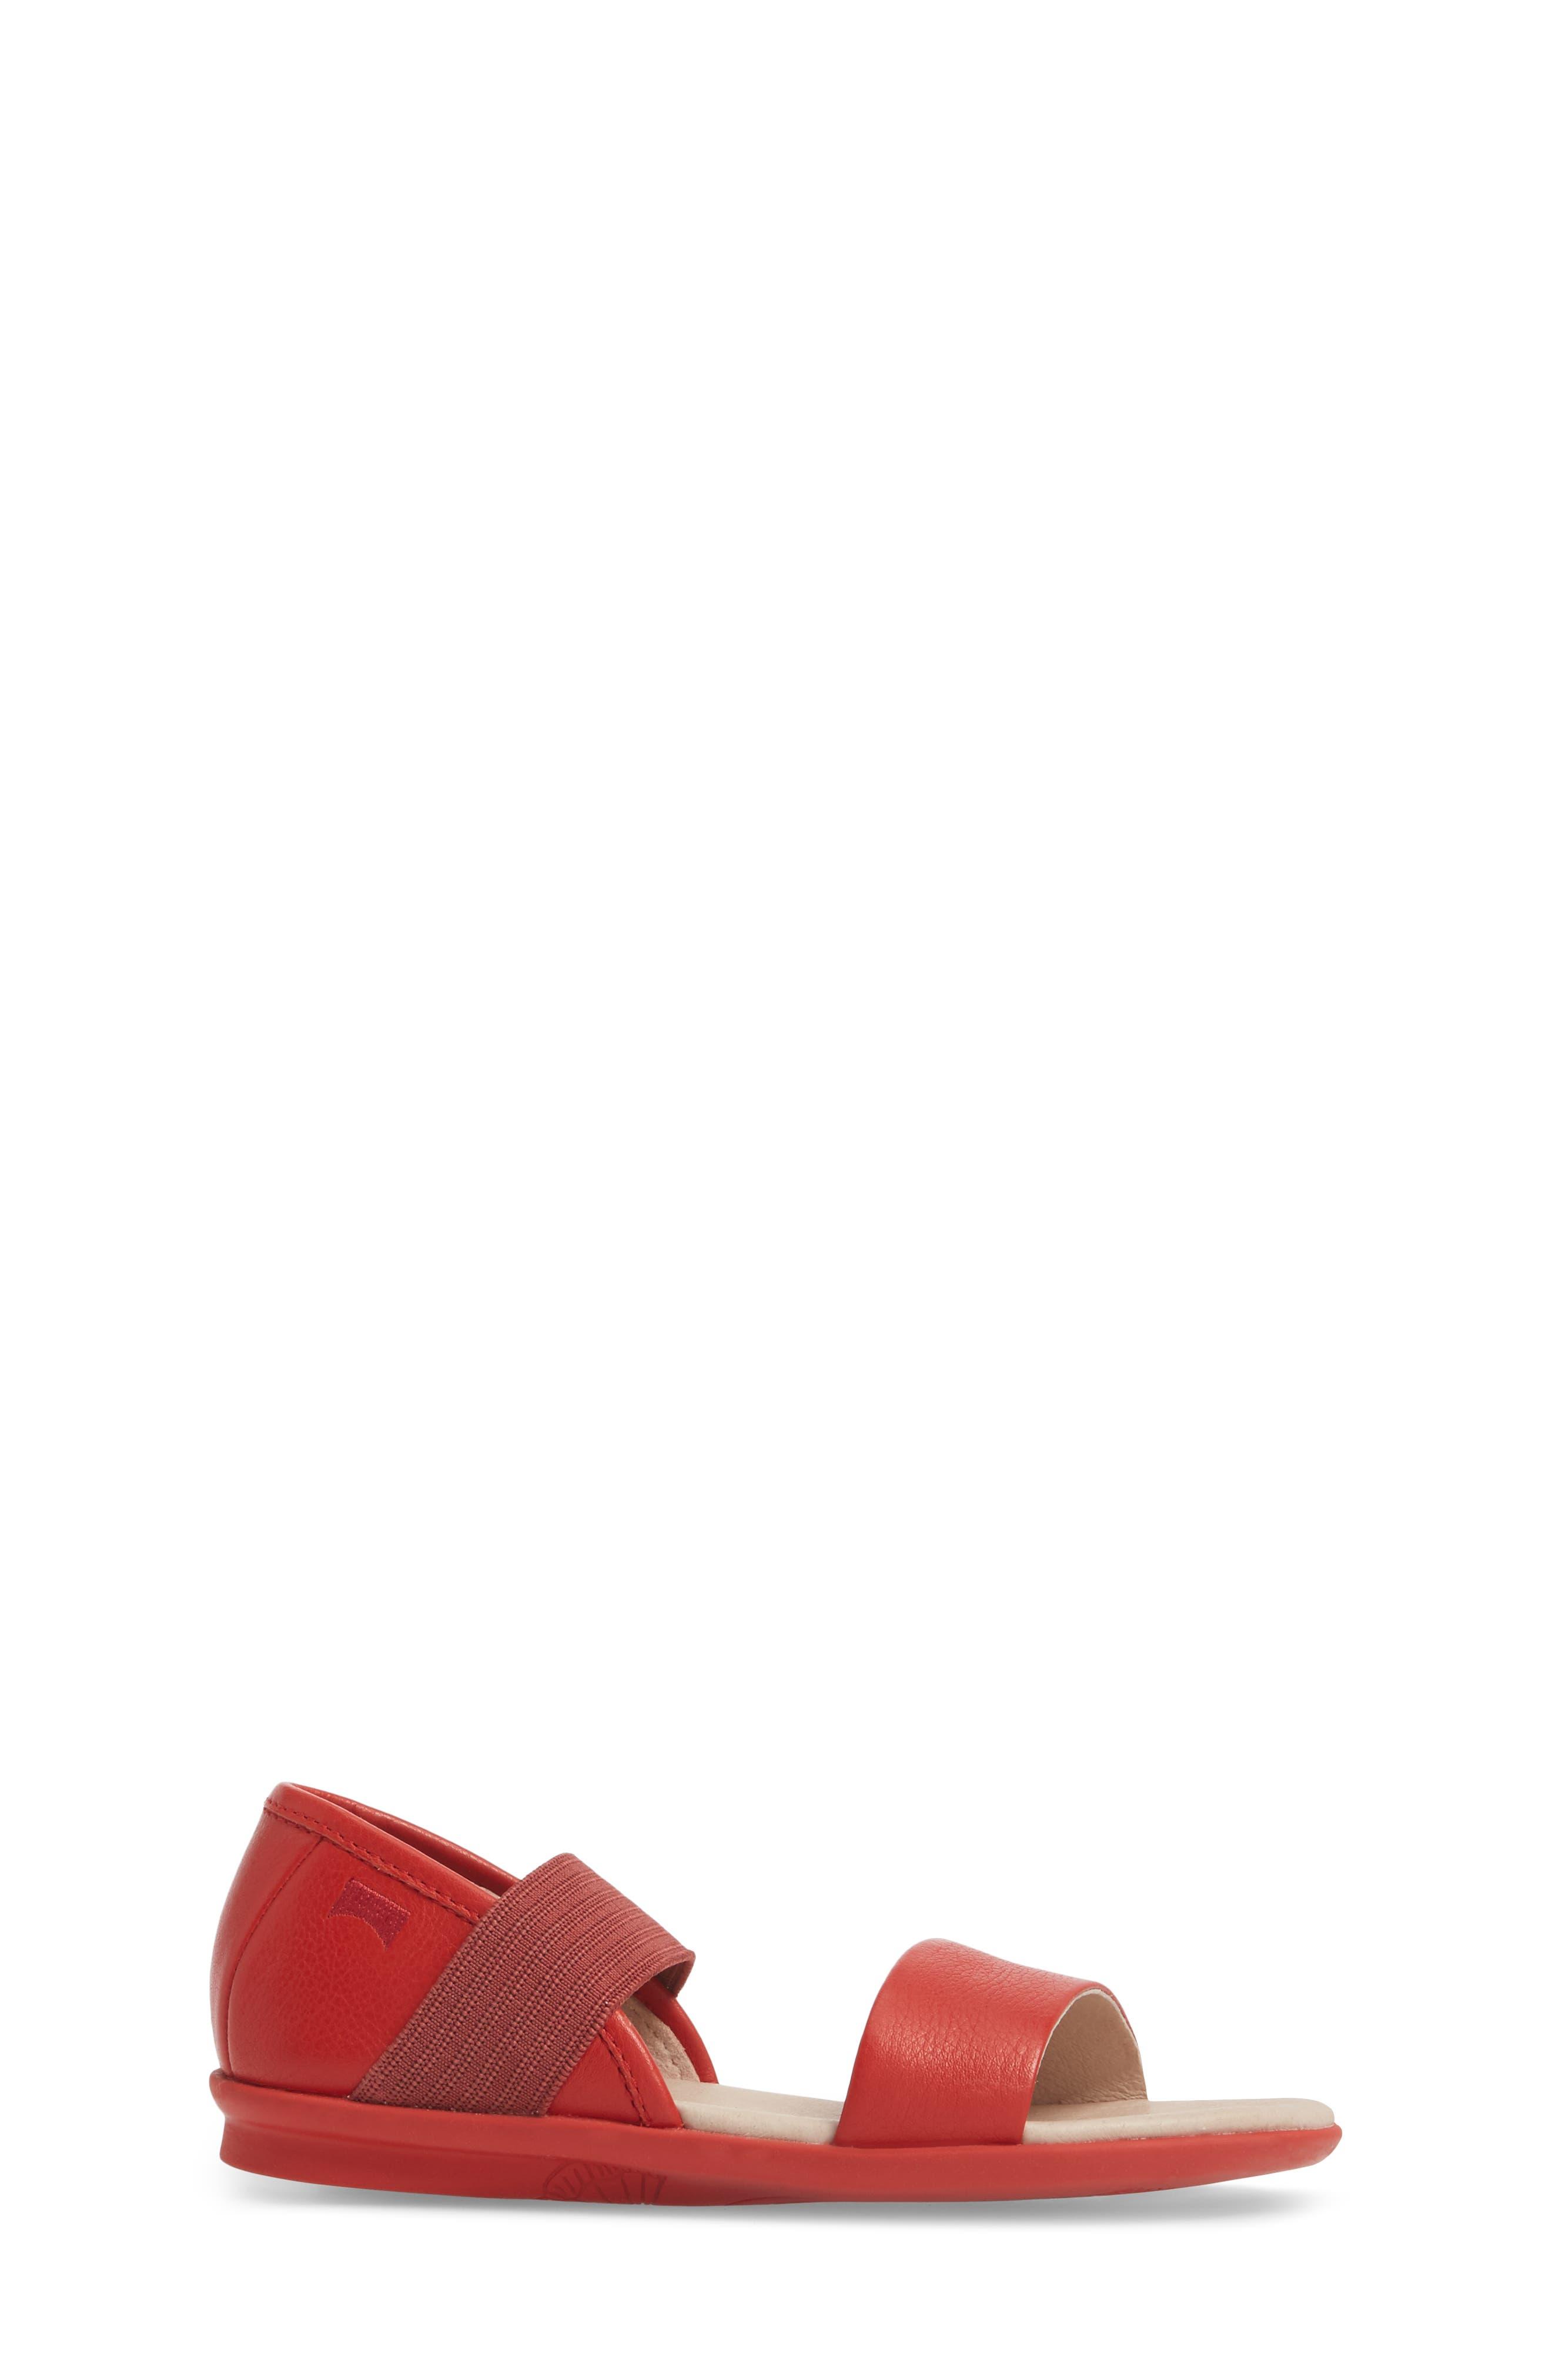 Right Sandal,                             Alternate thumbnail 3, color,                             Red